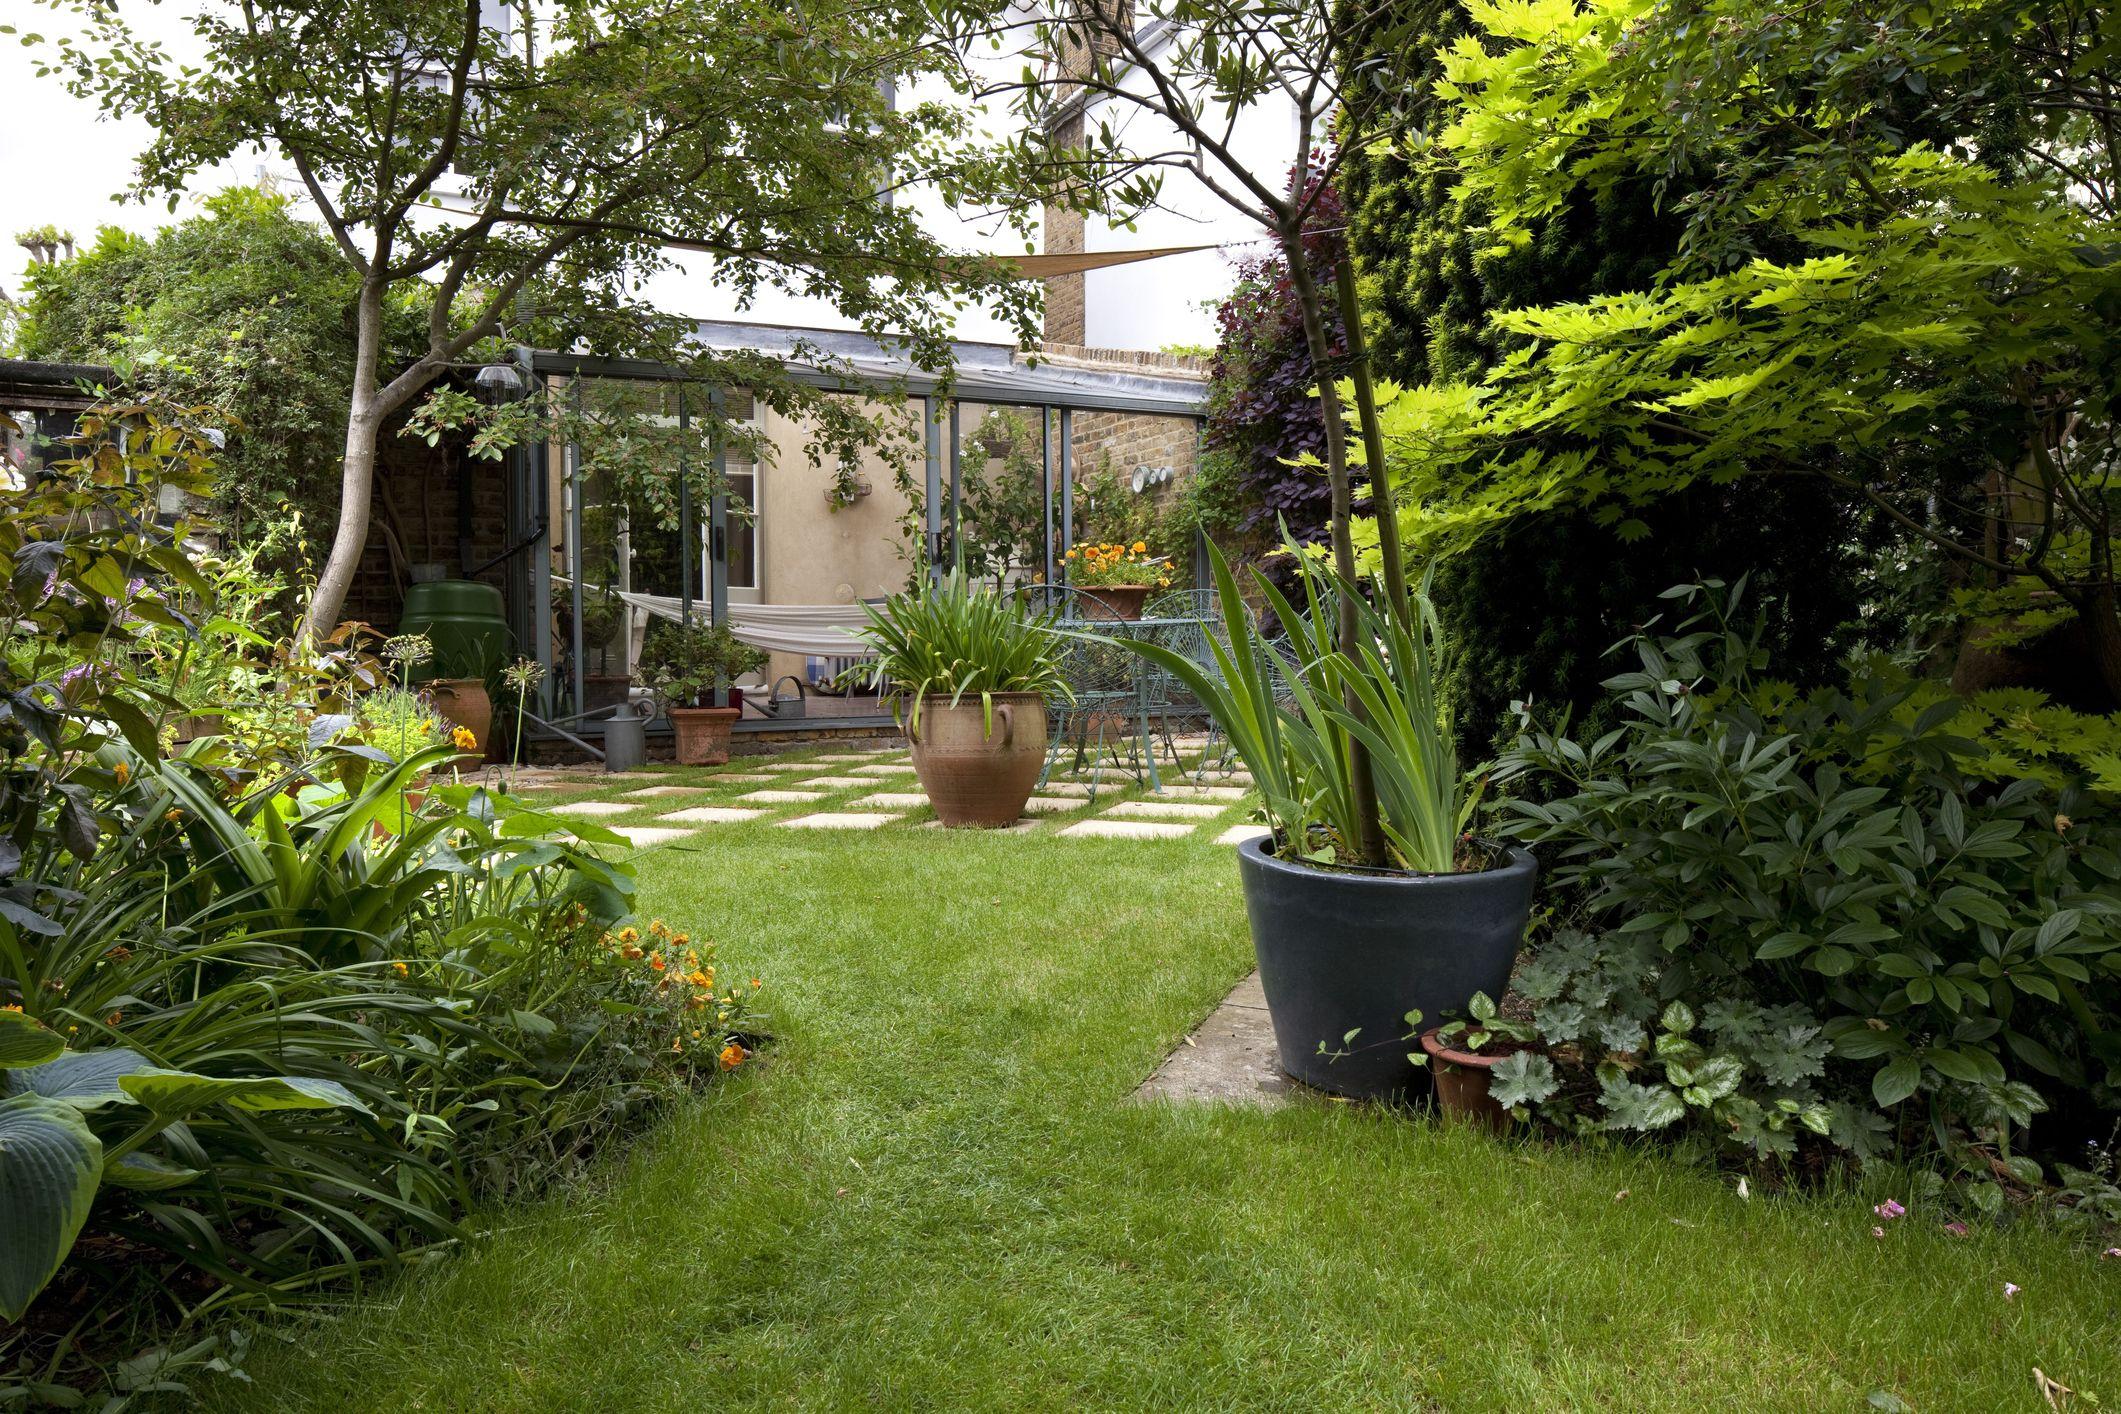 Suburban garden and lawn, Kingston Upon Thames, England, UK